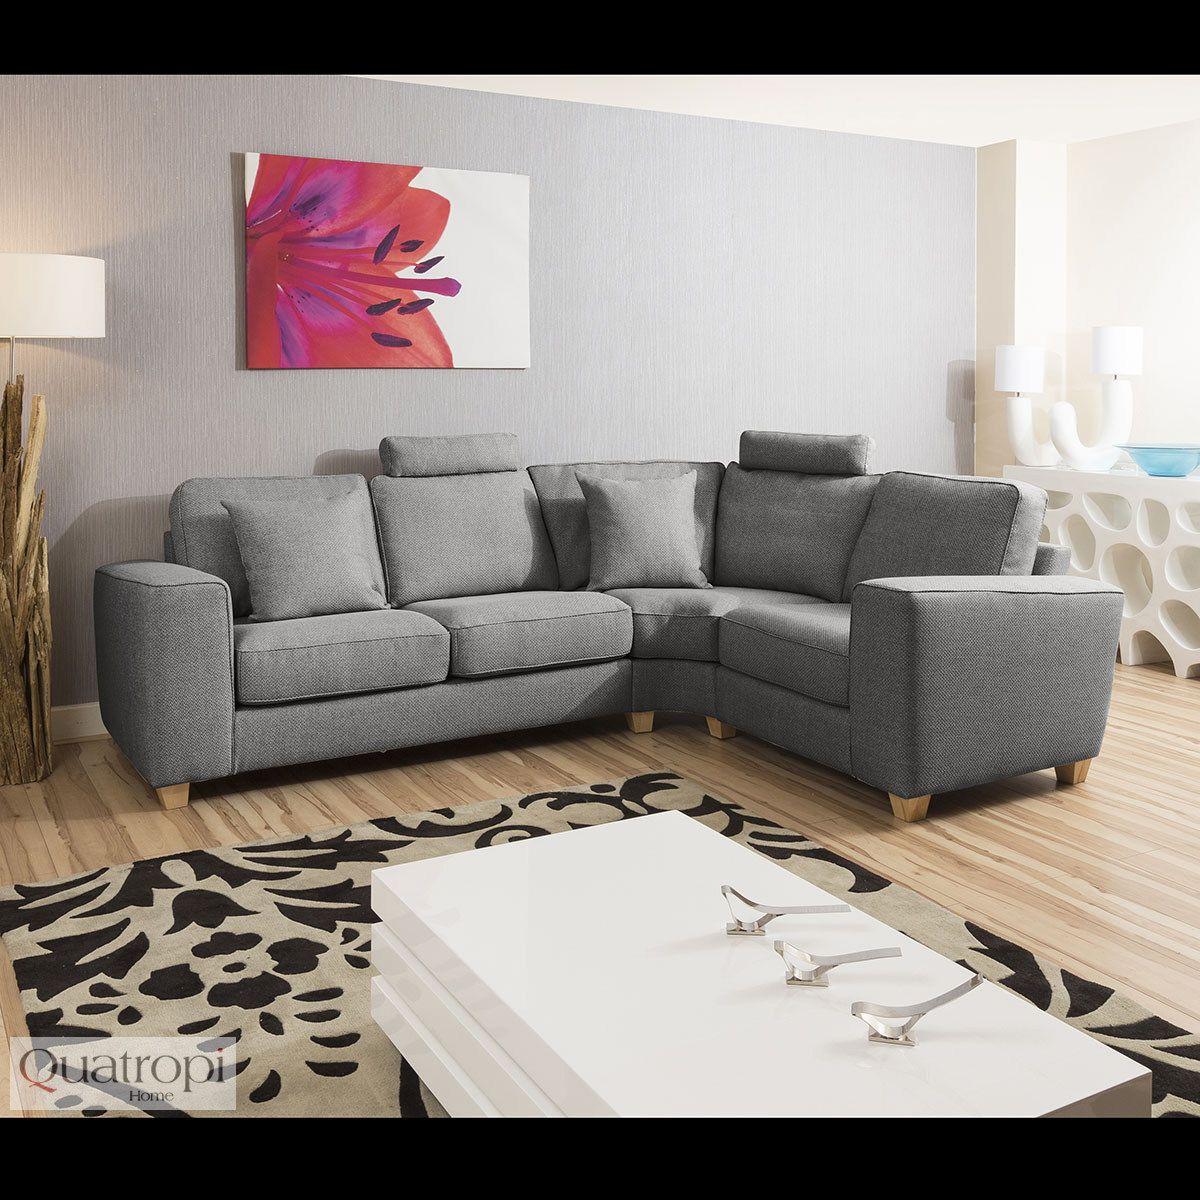 Modern Large L Shaped Sofa Corner Group 2 8 X 2 1 Mtr Grey Today 7l L Shaped Sofa Sofa Set Furniture Design